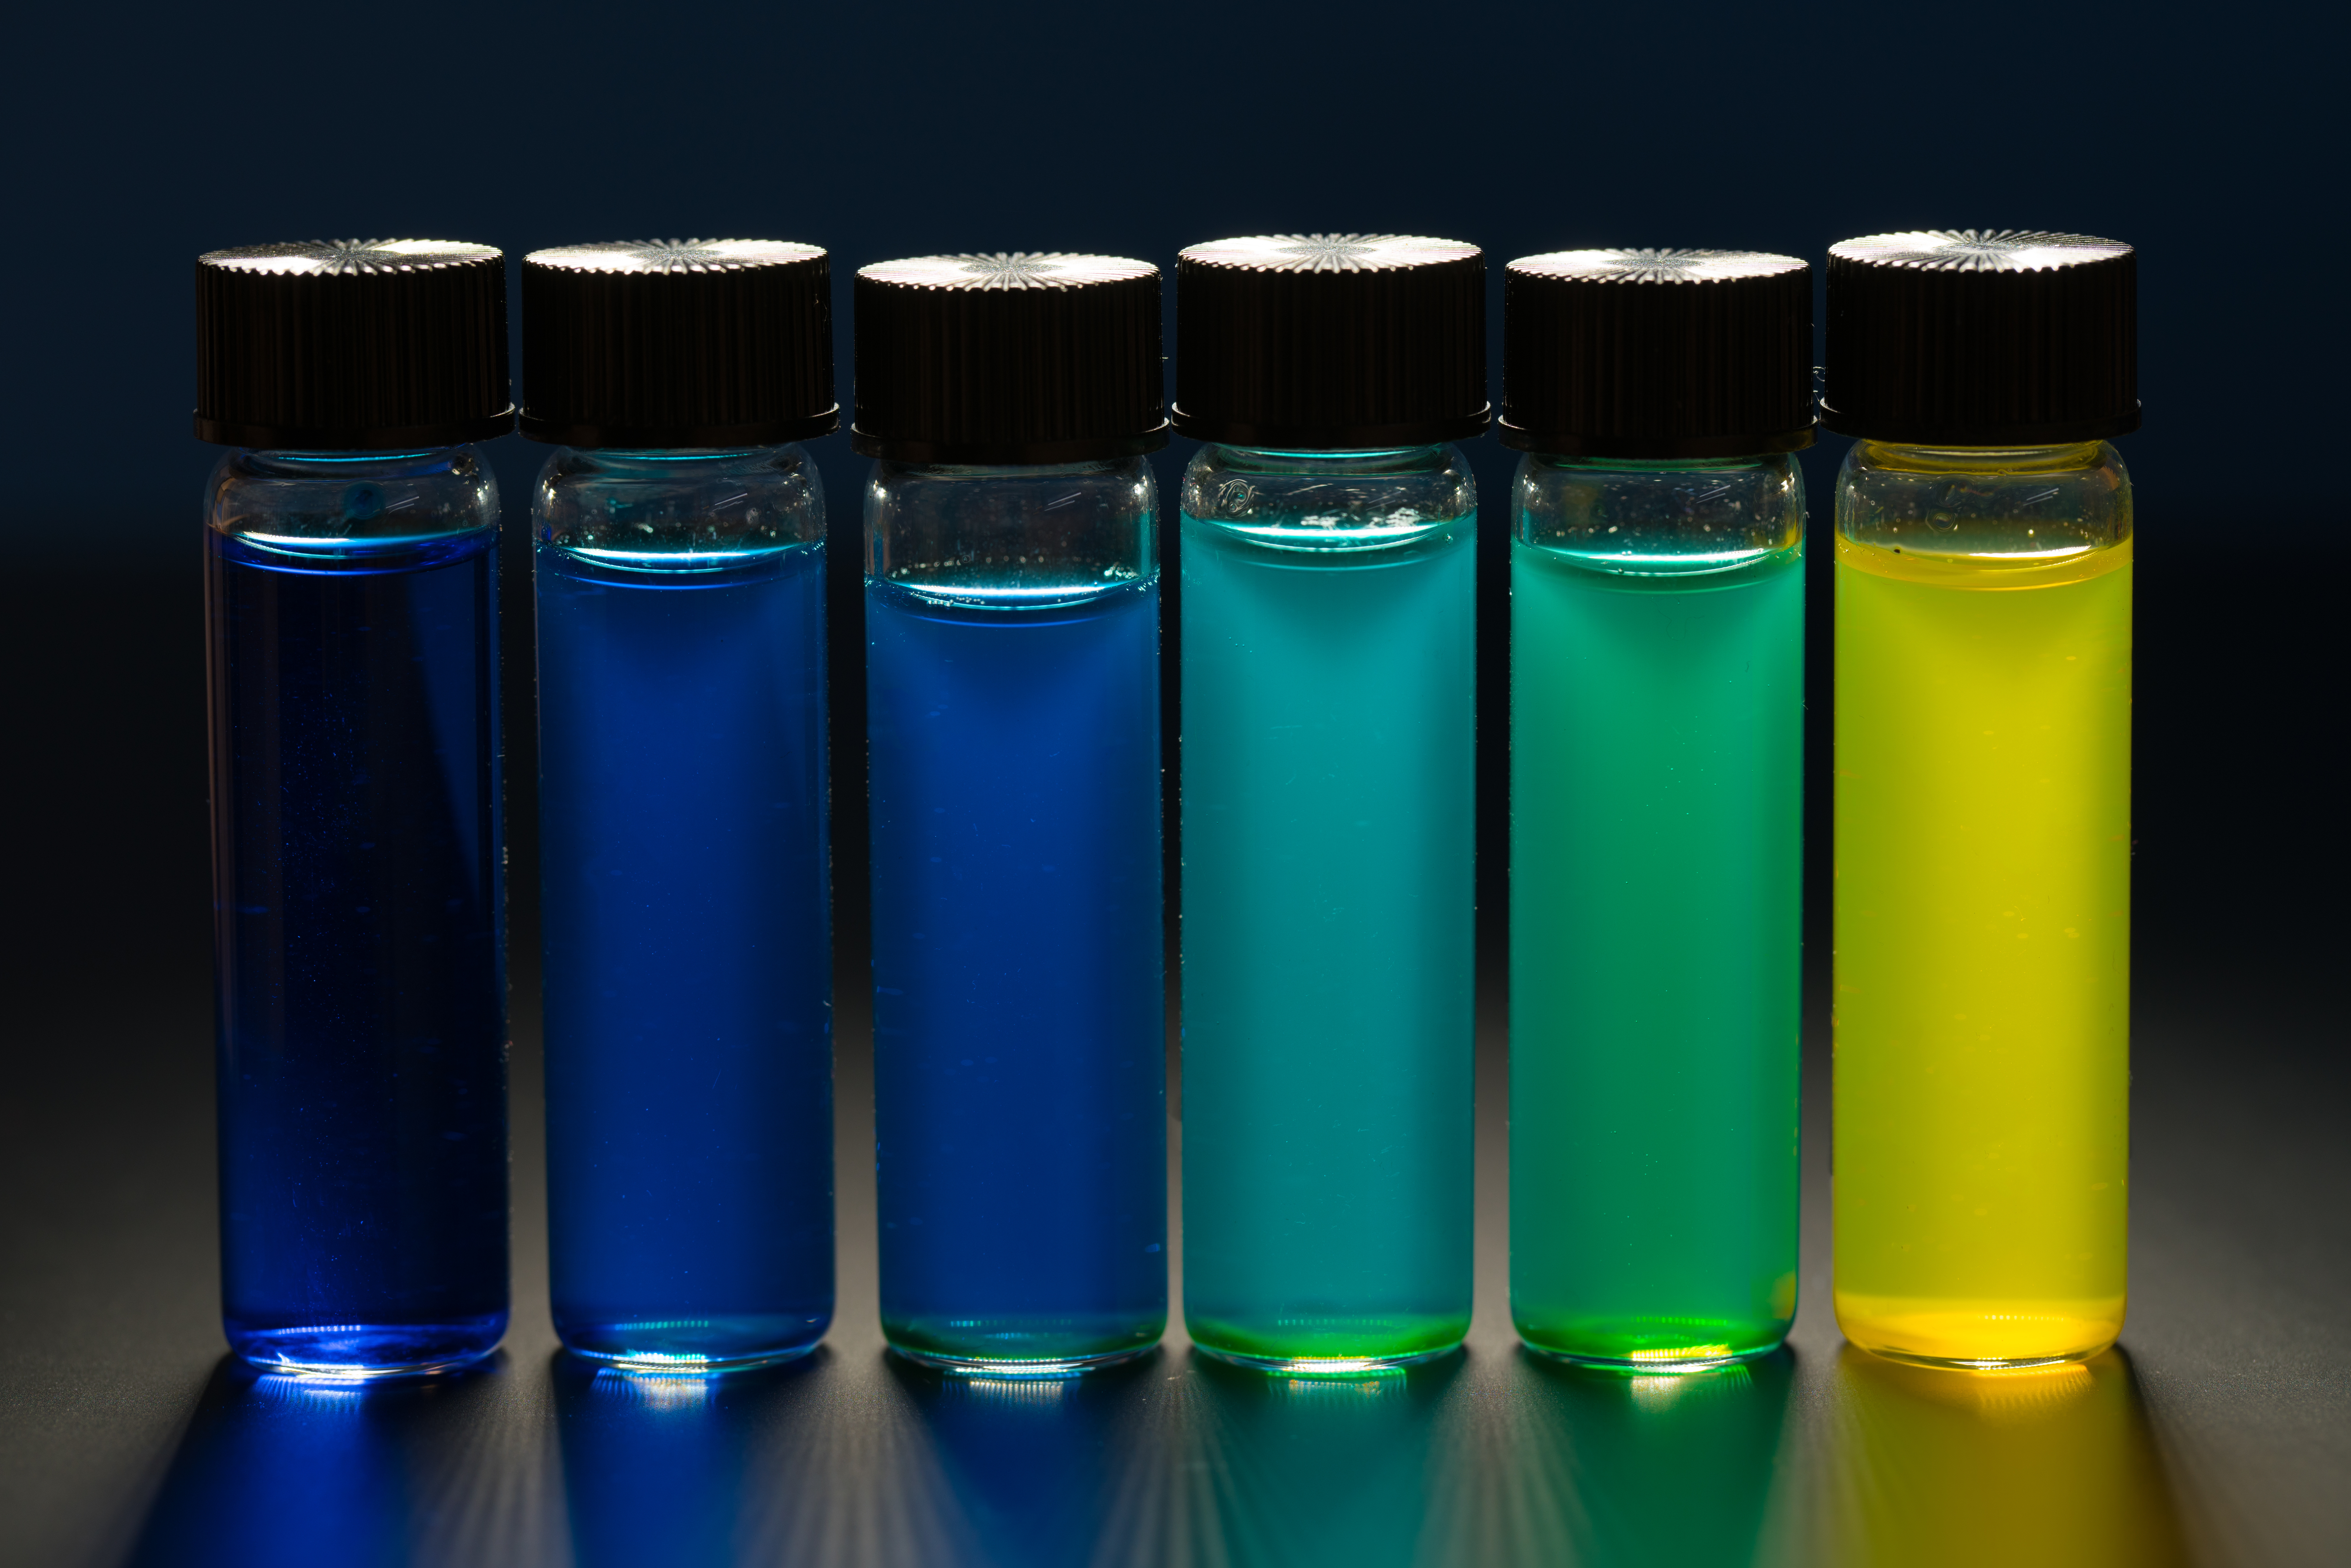 Multi-colored liquid in the vials